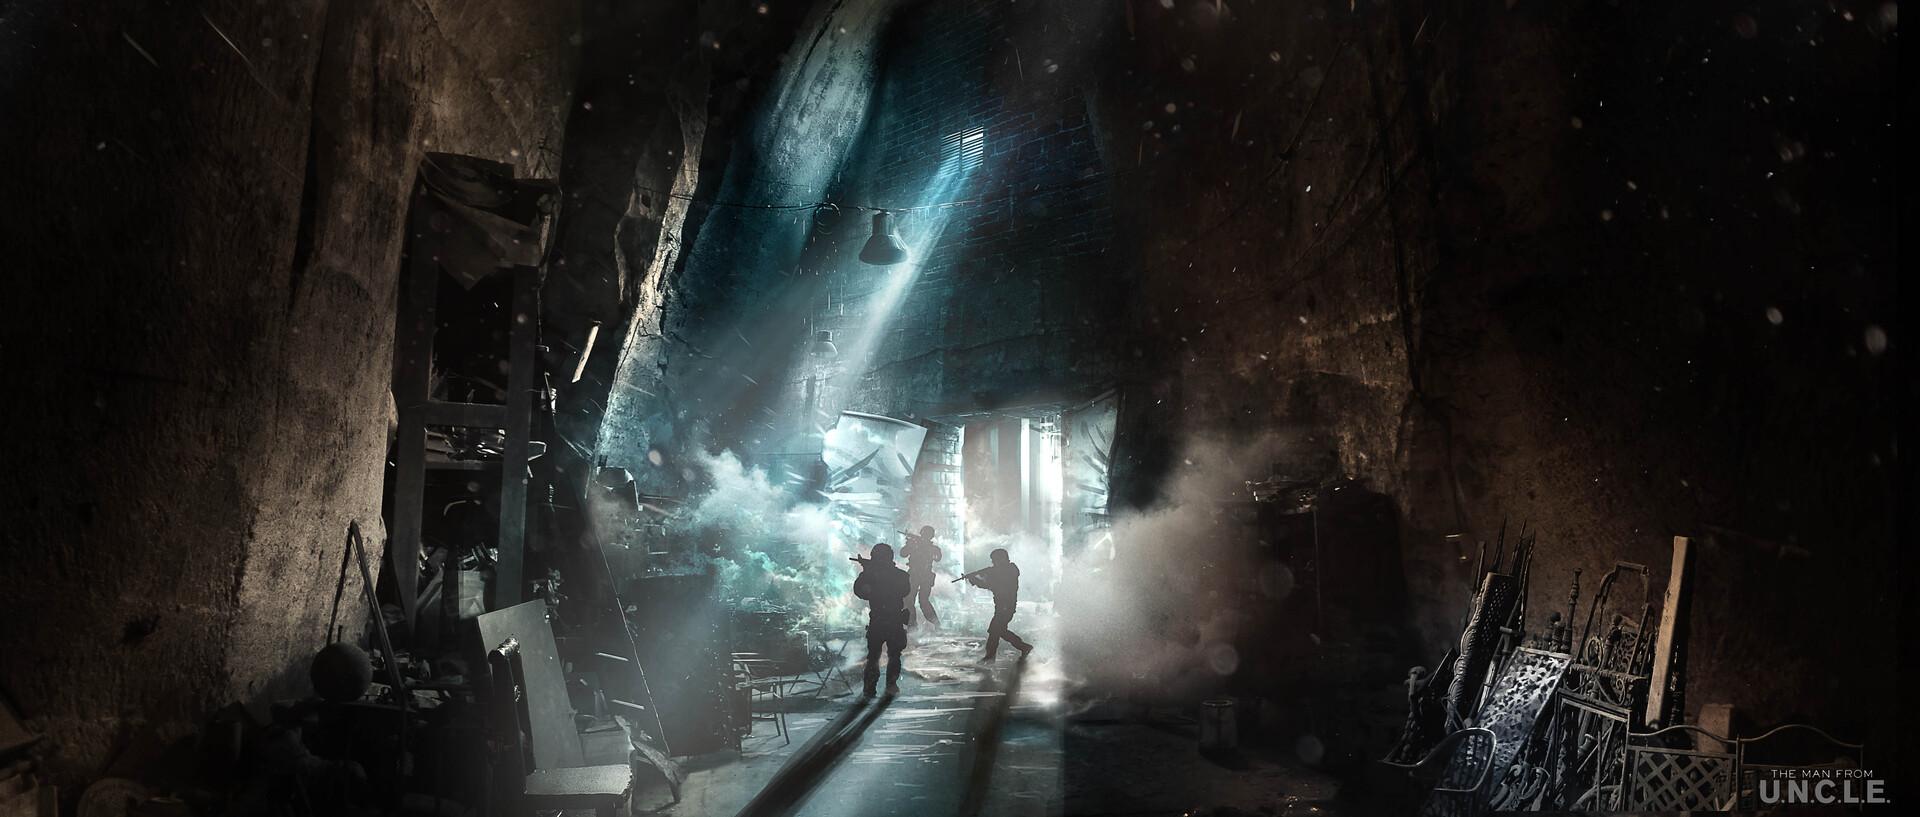 Kieran belshaw skorpios island cave door v004 web